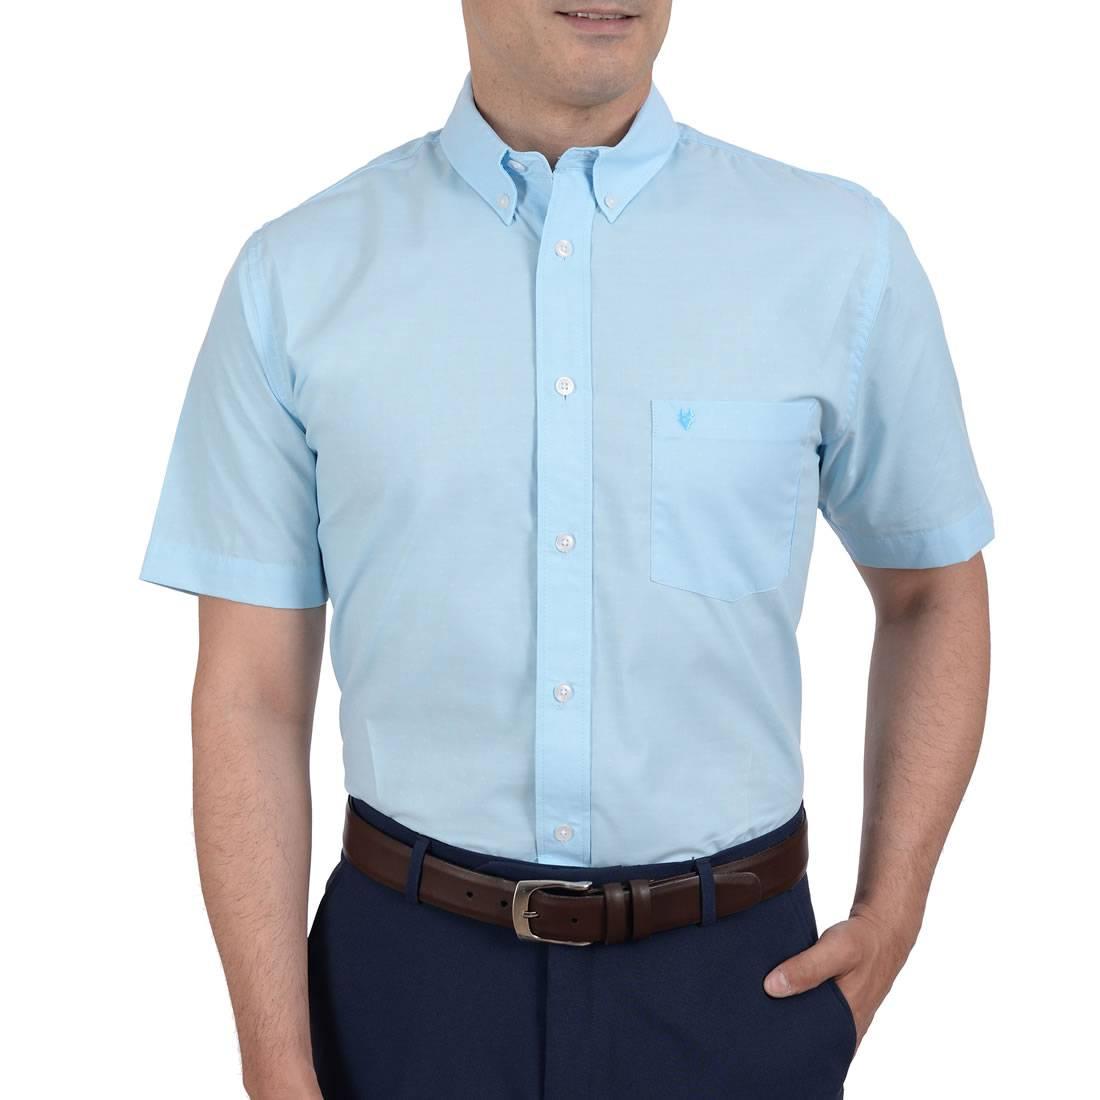 042201432426-01-Camisa-Casual-Manga-Corta-Botton-Down-Falso-Liso-Classic-Fit-Menta-yale